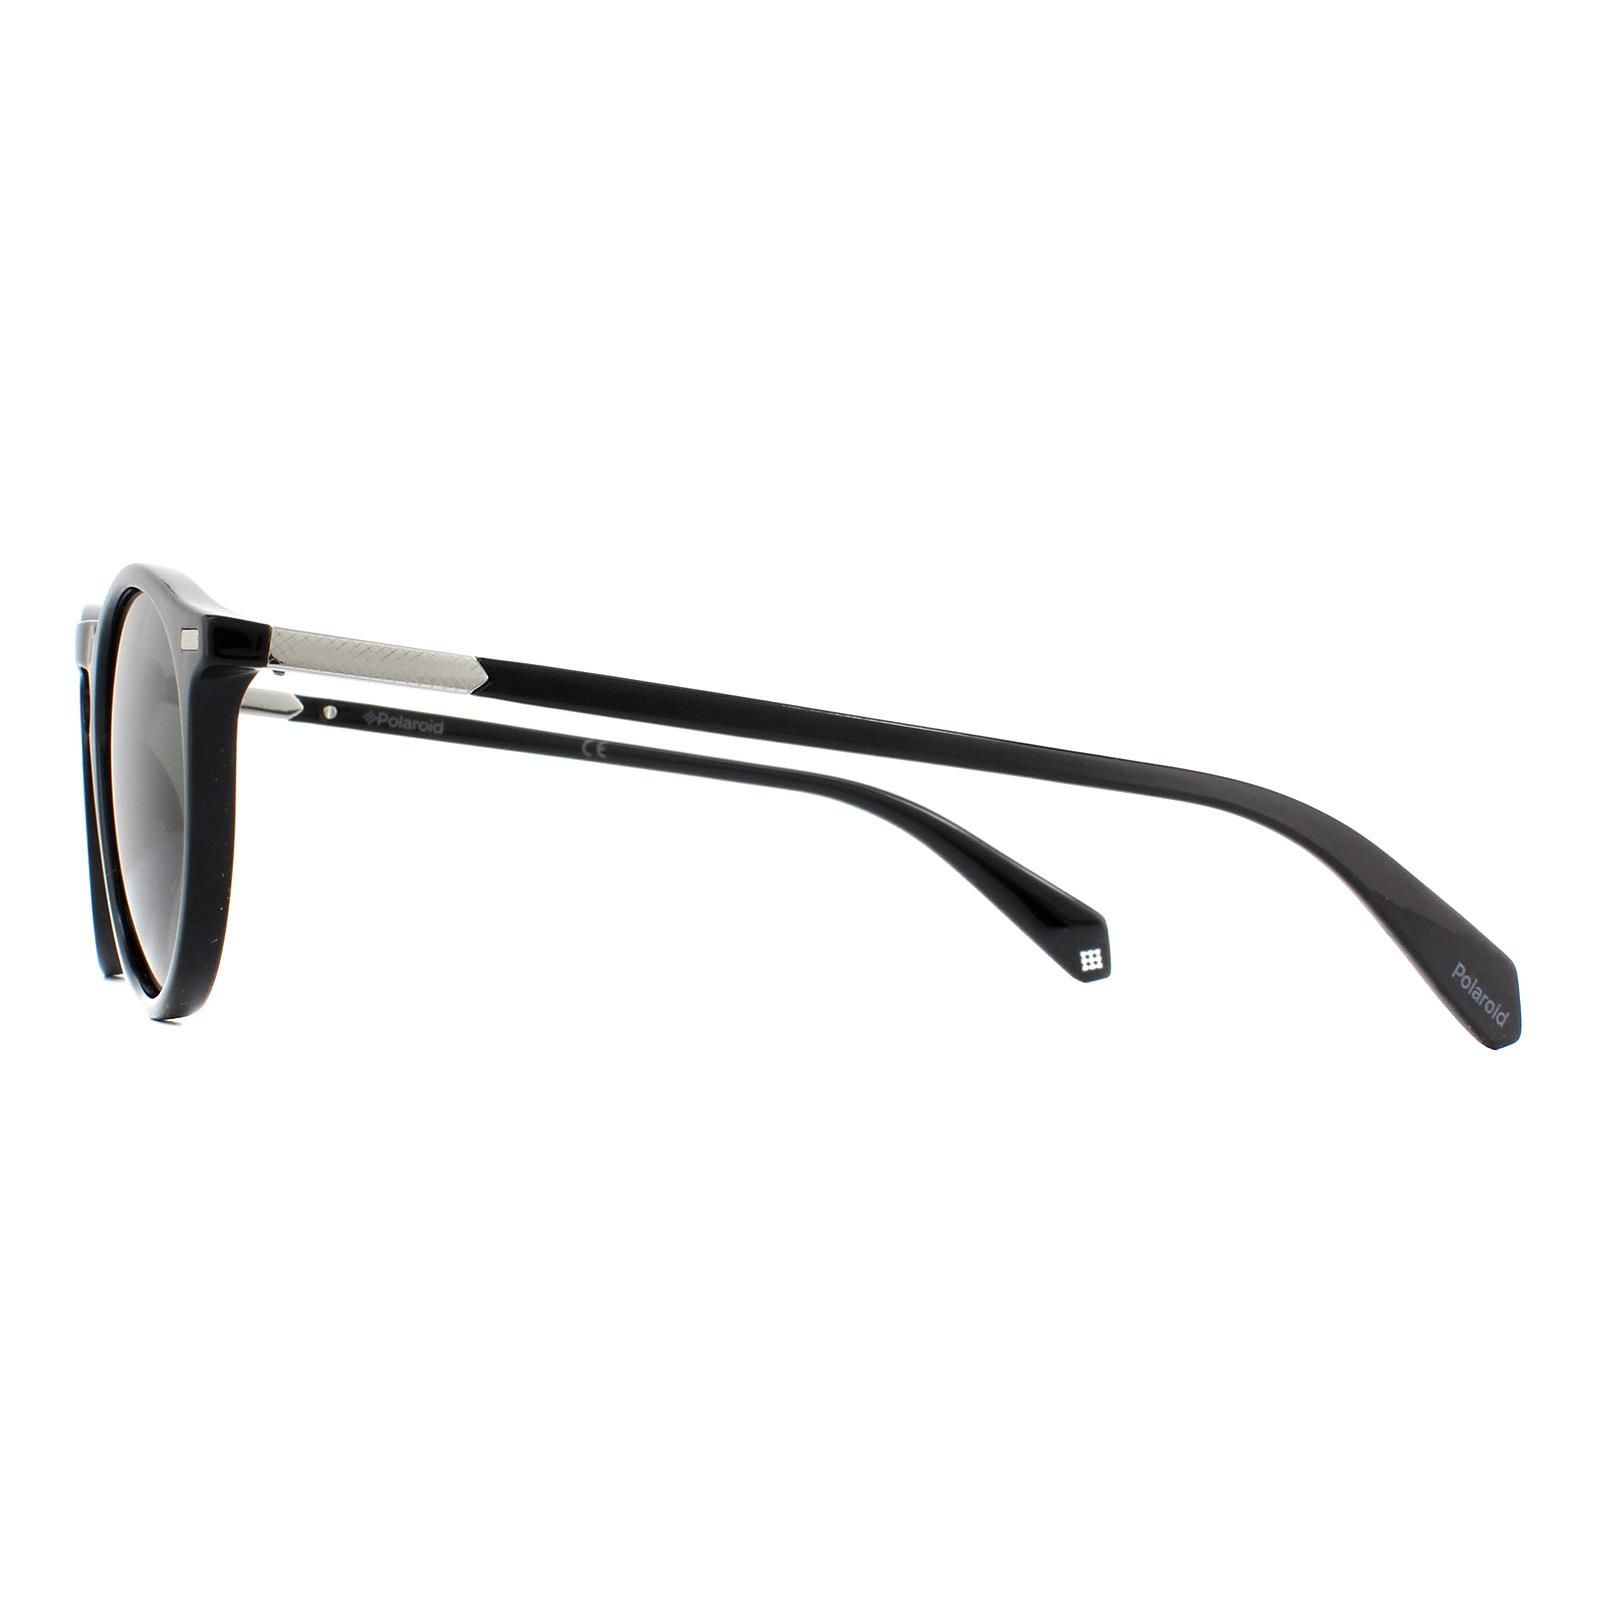 Polaroid Sunglasses PLD 2086/S 807 UC Black Green Polarized